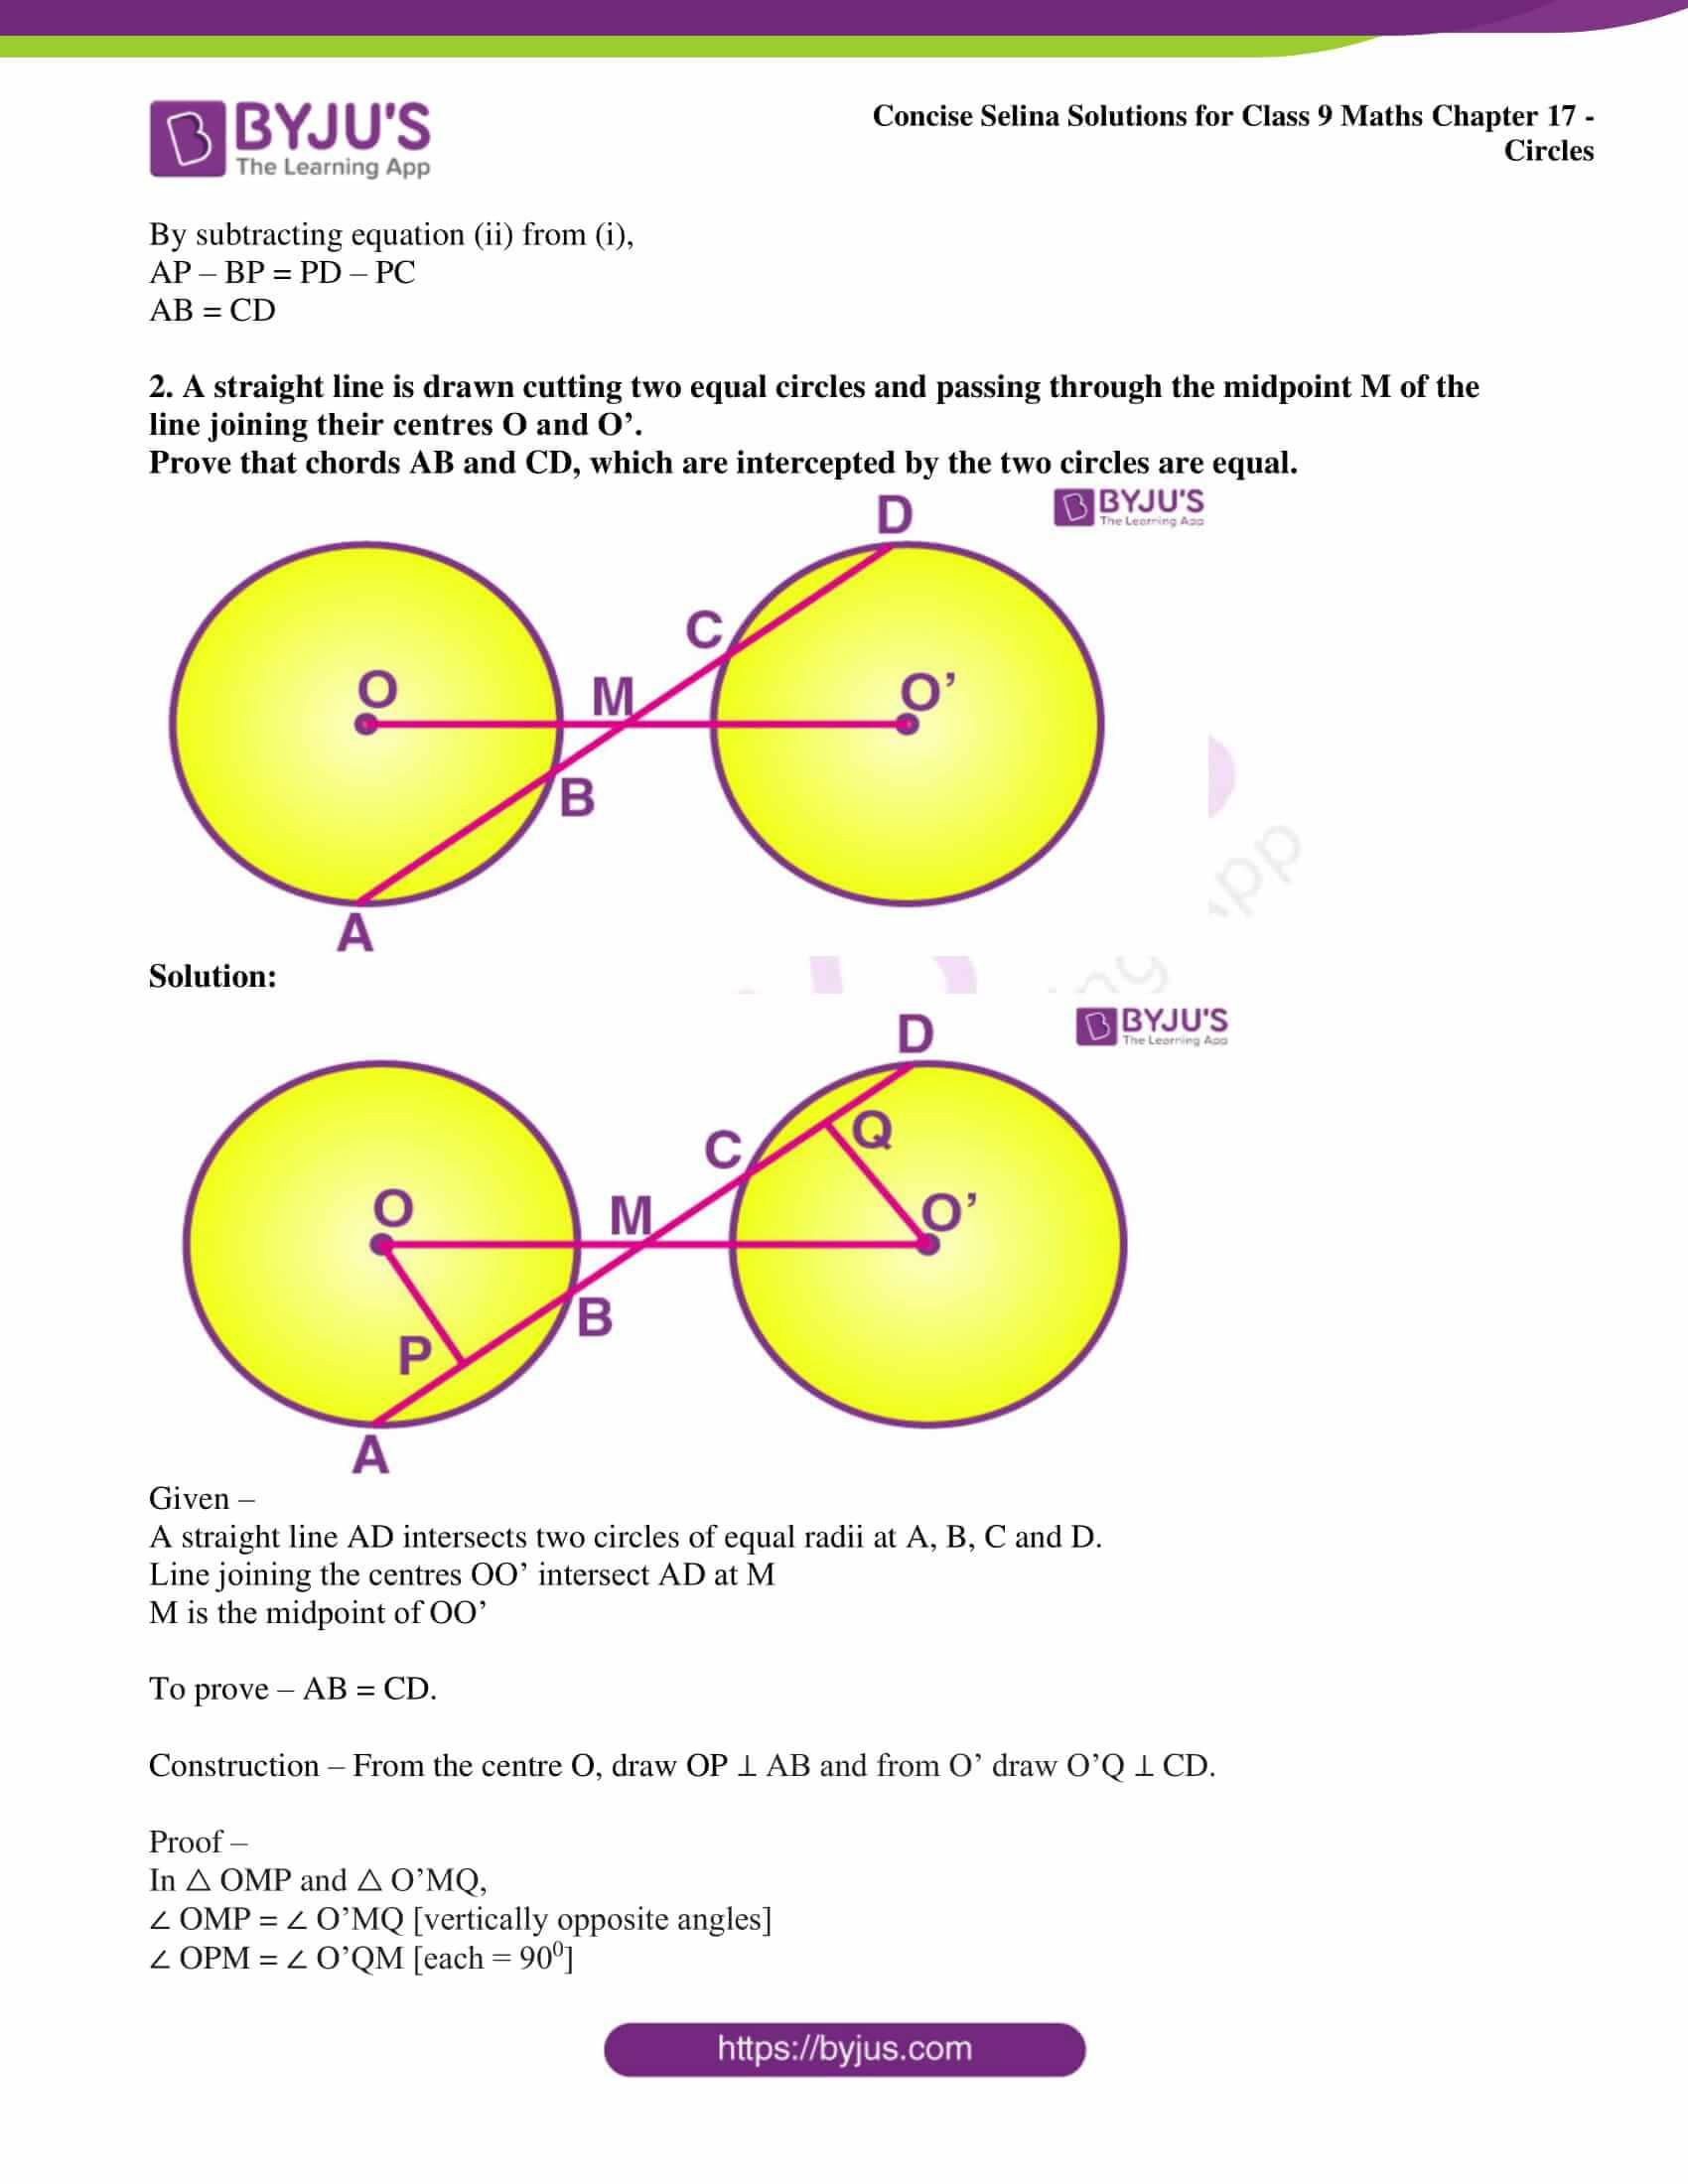 icse class 9 maths may10 selina solutions chapter 17 circles 07